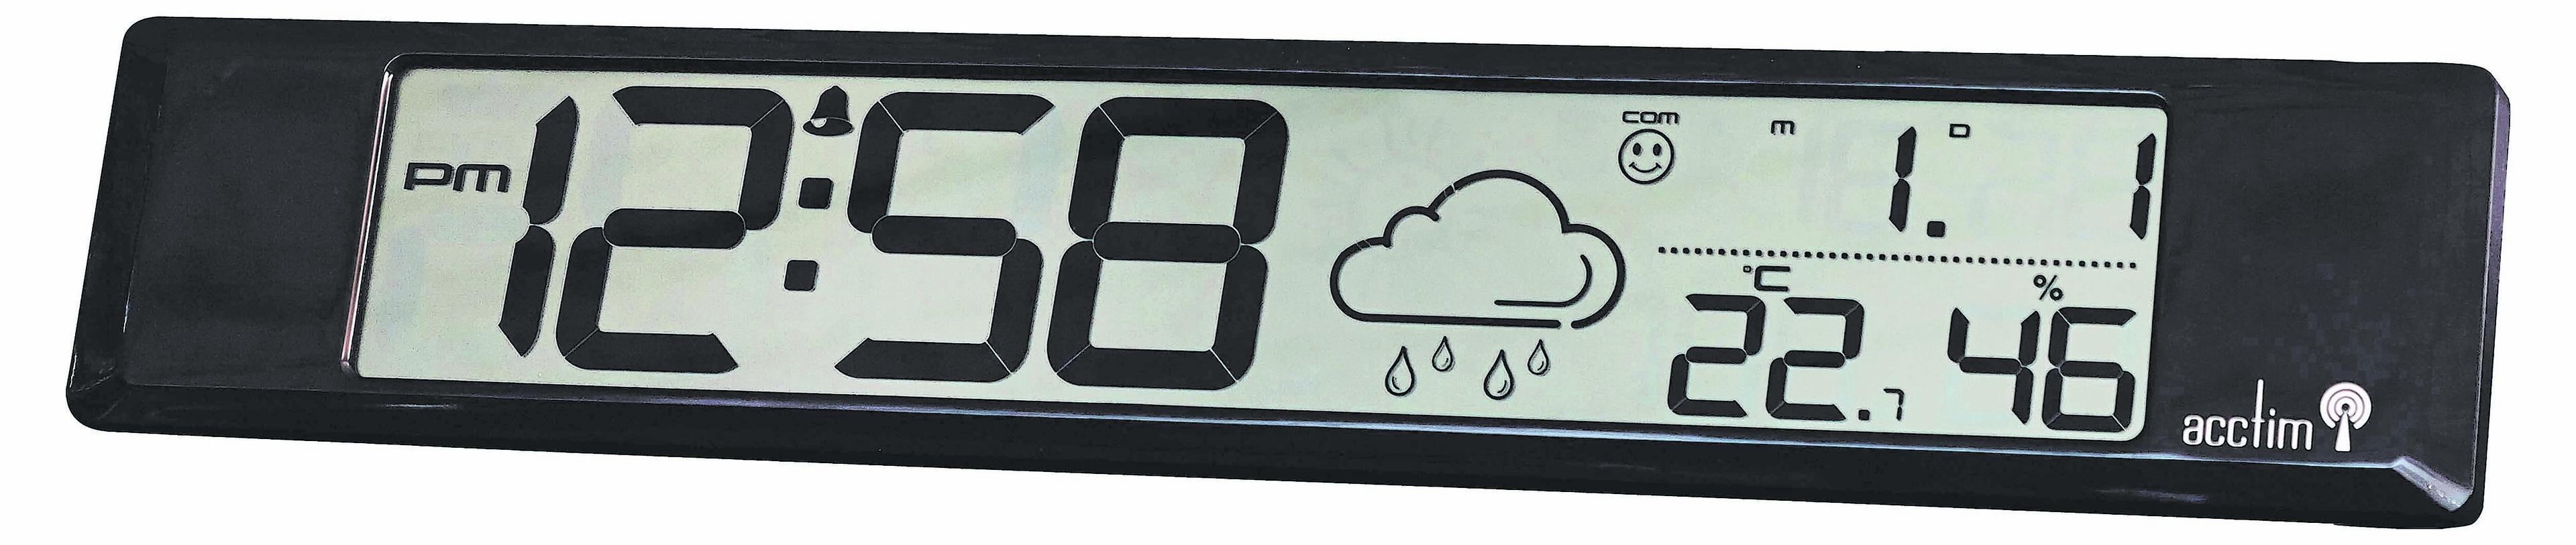 GADGETS Alarm Clocks 092360